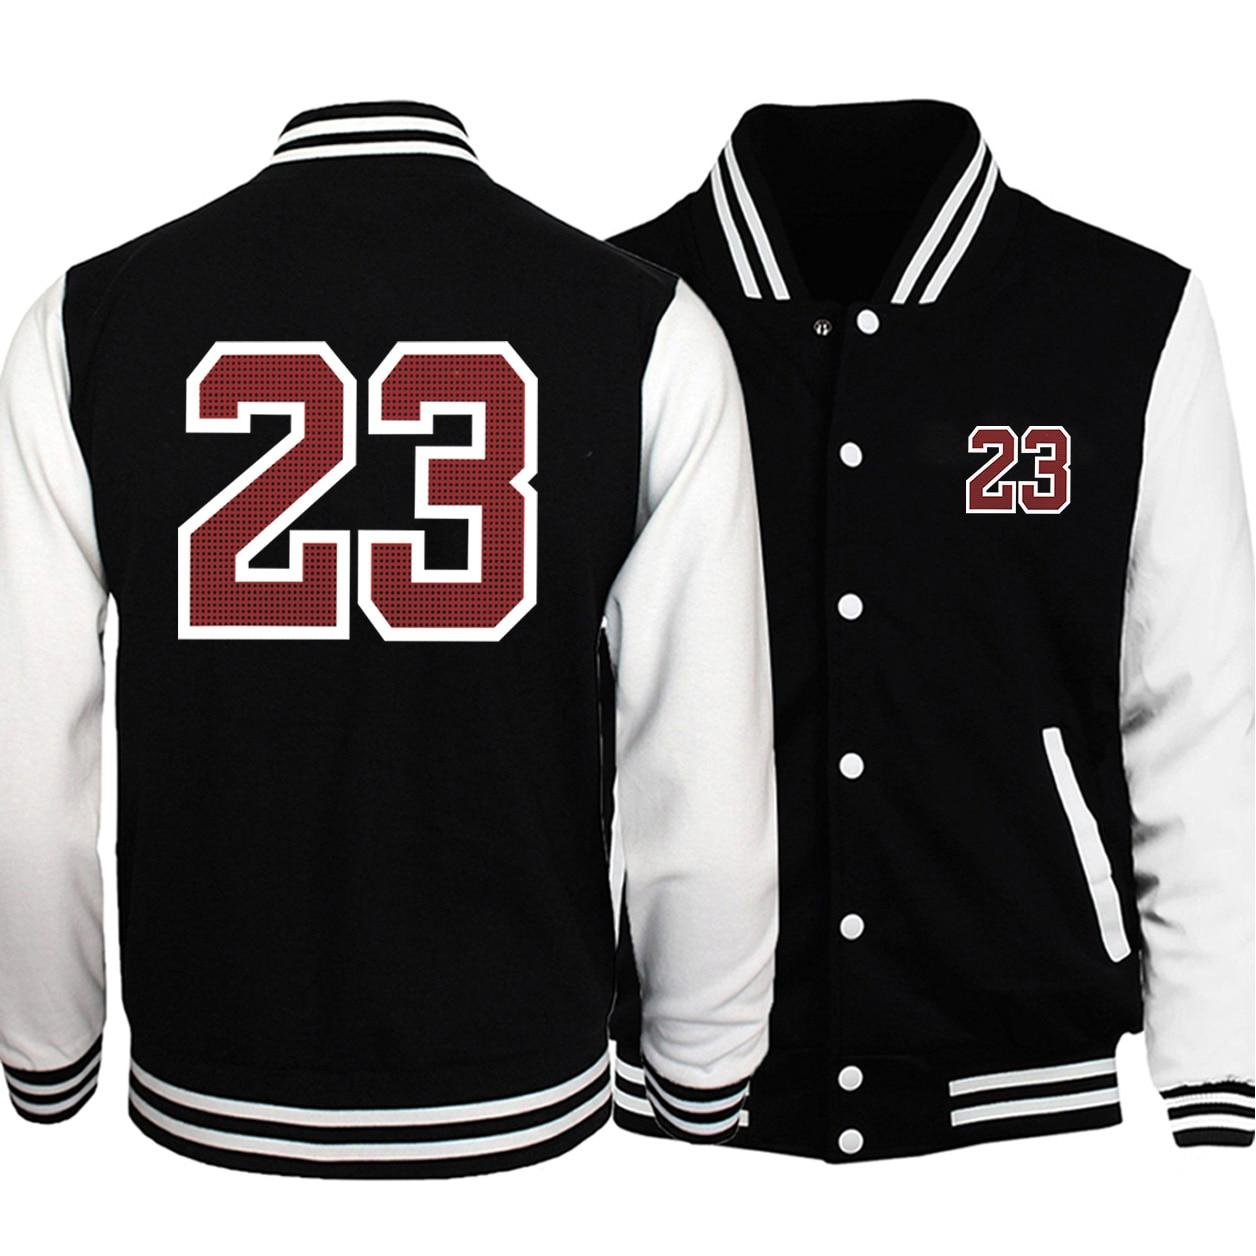 Hot Sale Men Baseball Uniform Coat 2021 Autumn Bomber Jacket Letter 23 Print Streetwear Casual Tracksuit Hip Hot Men Brand Coats